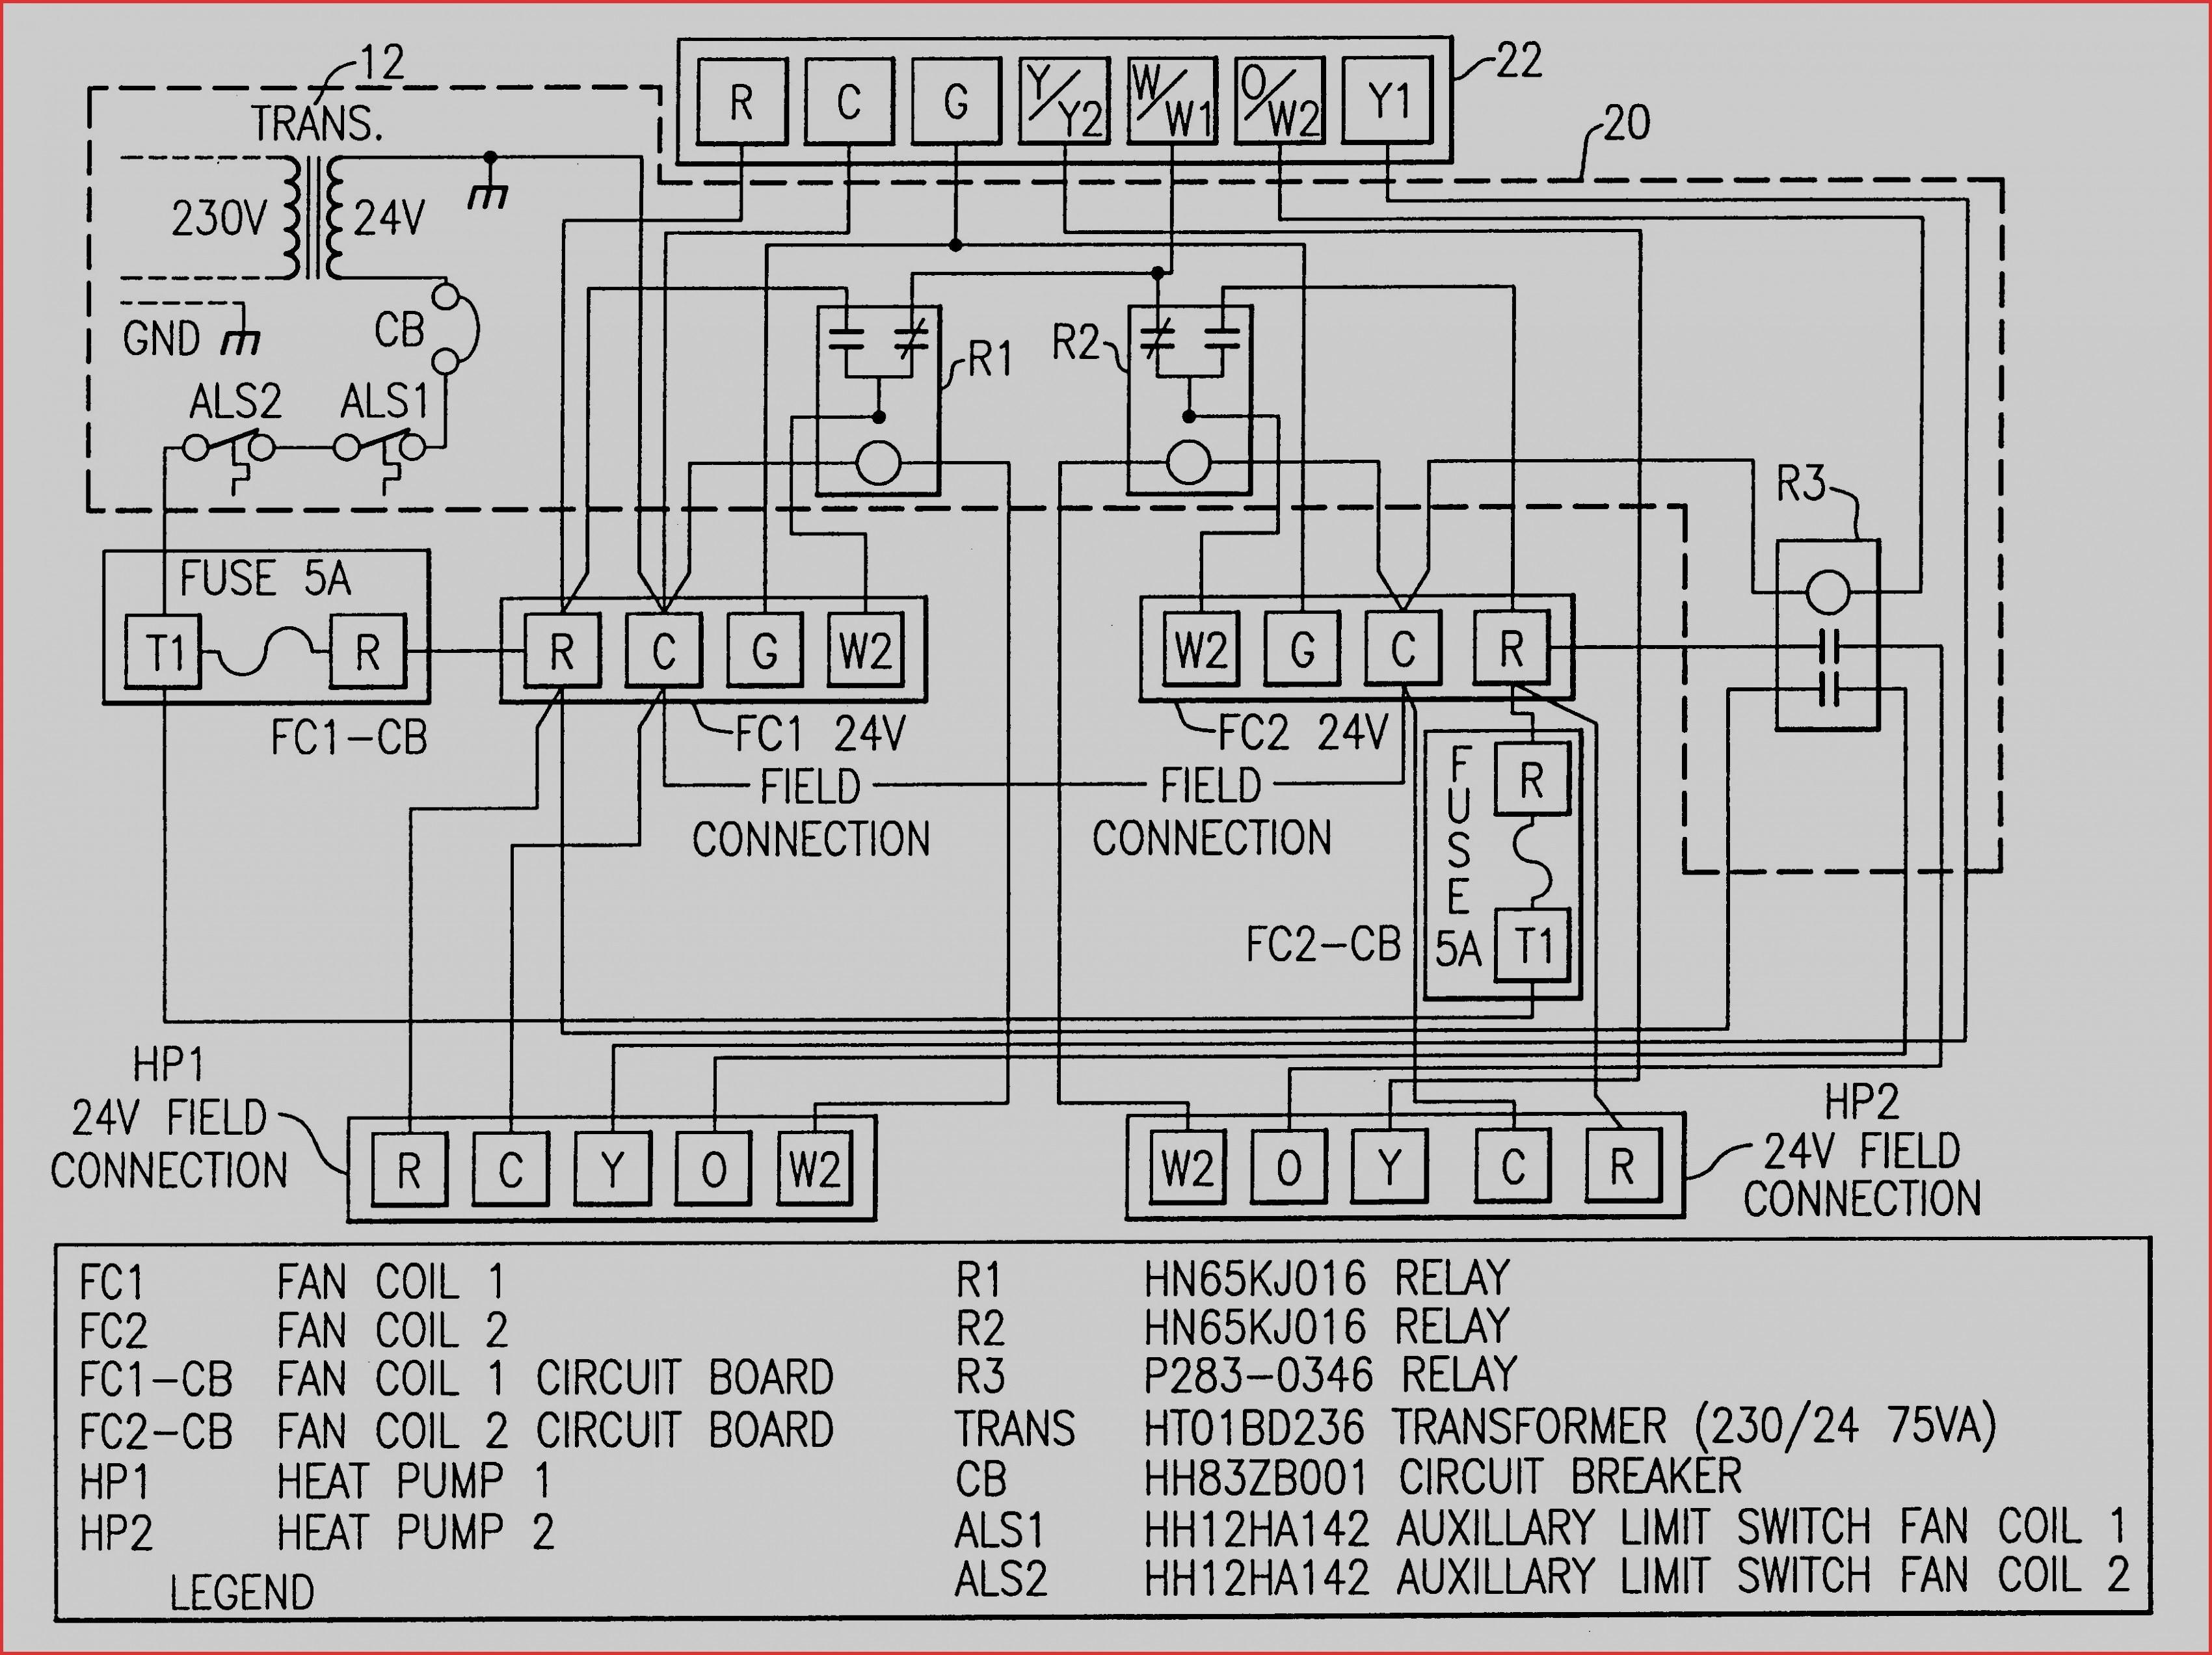 Wiring Diagram Honeywell Heat Pump Thermostat Wiring Diagram Honeywell